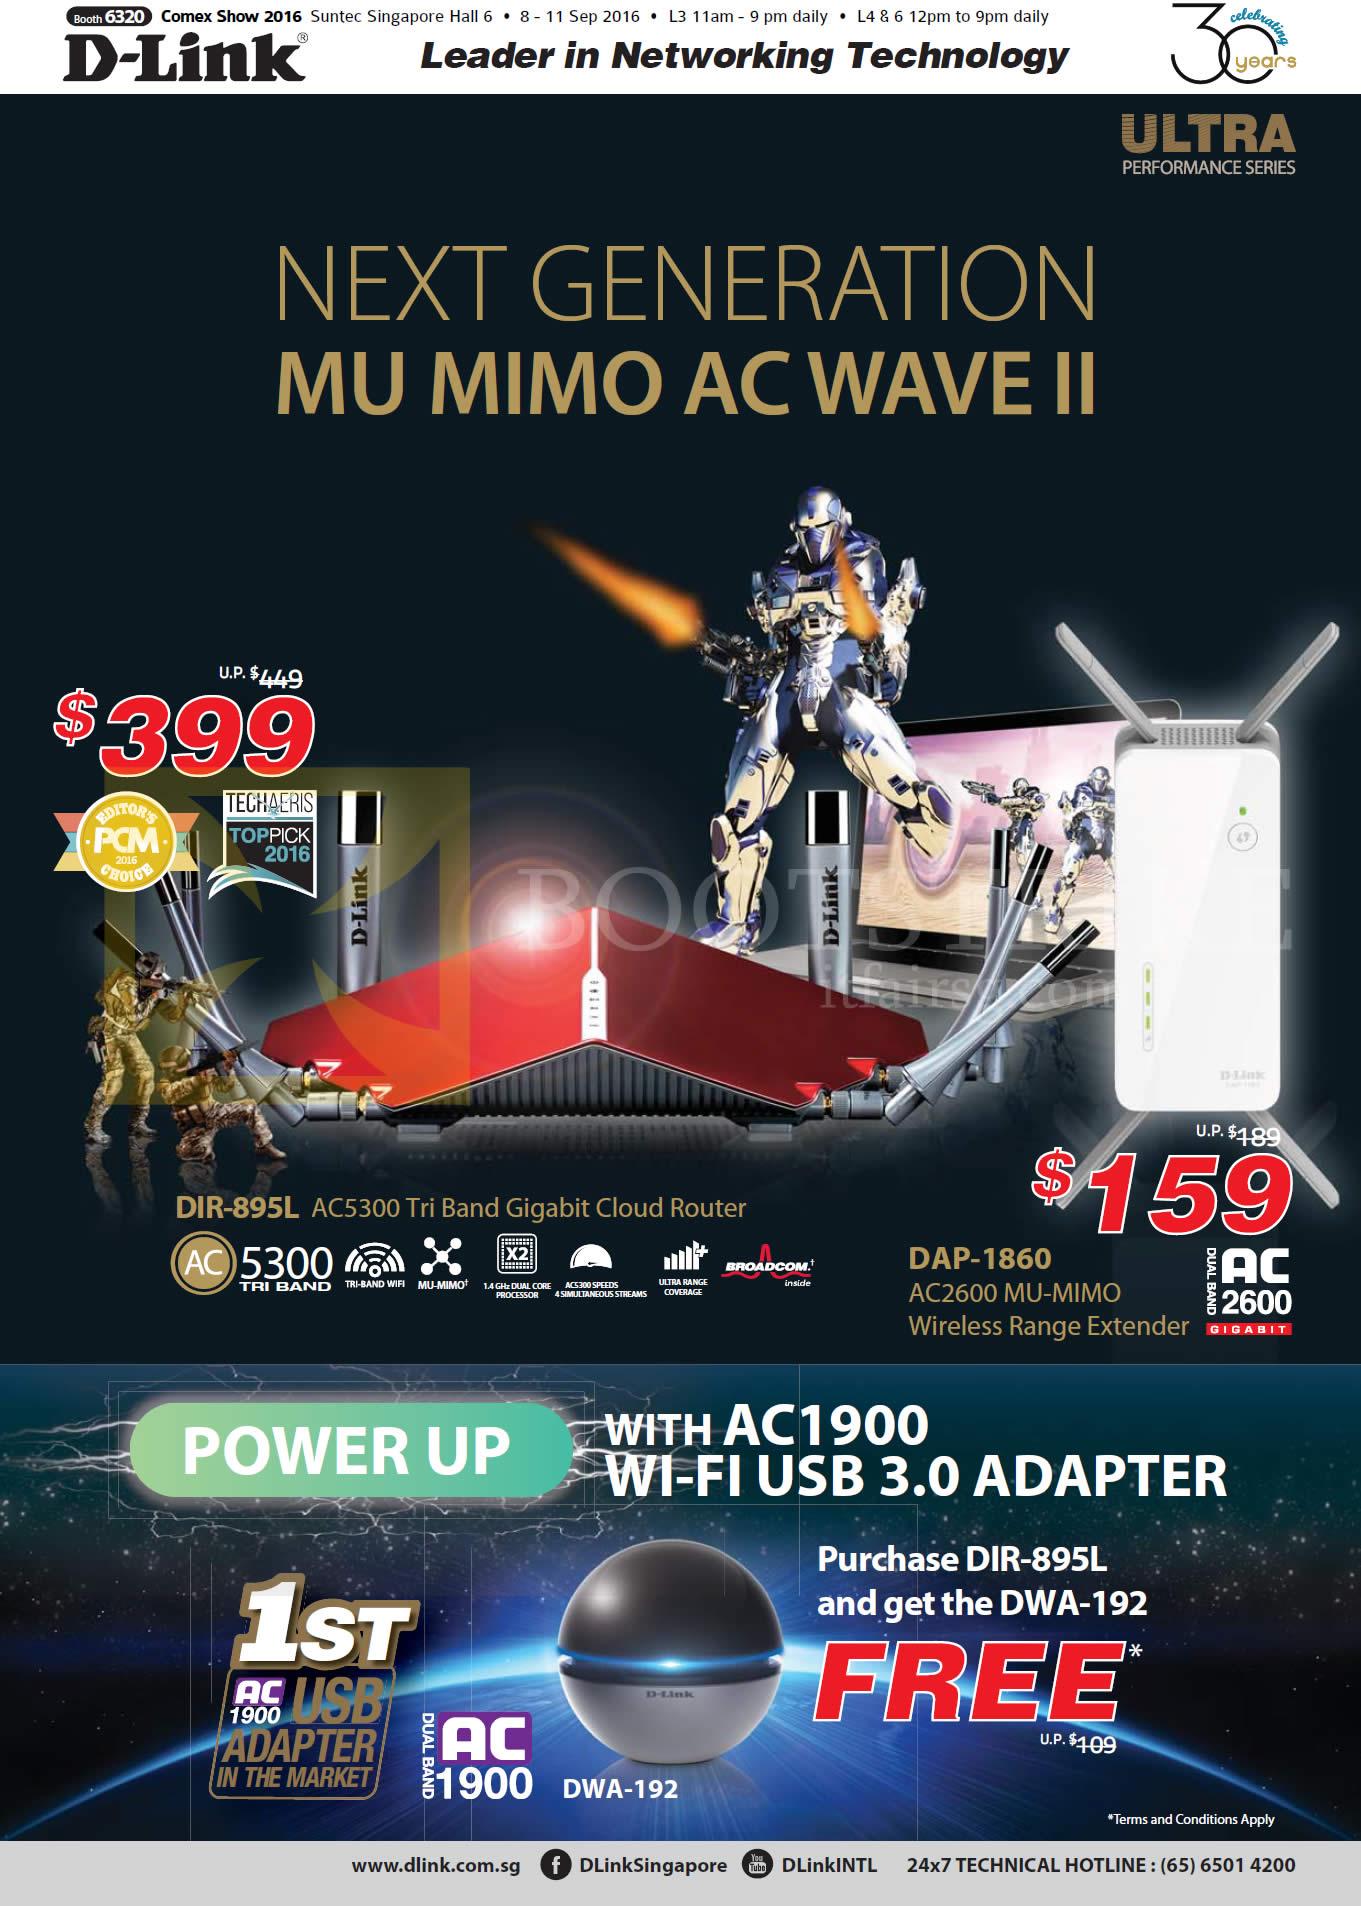 COMEX 2016 price list image brochure of D-Link Networking DIR-895L Router, DAP-1860